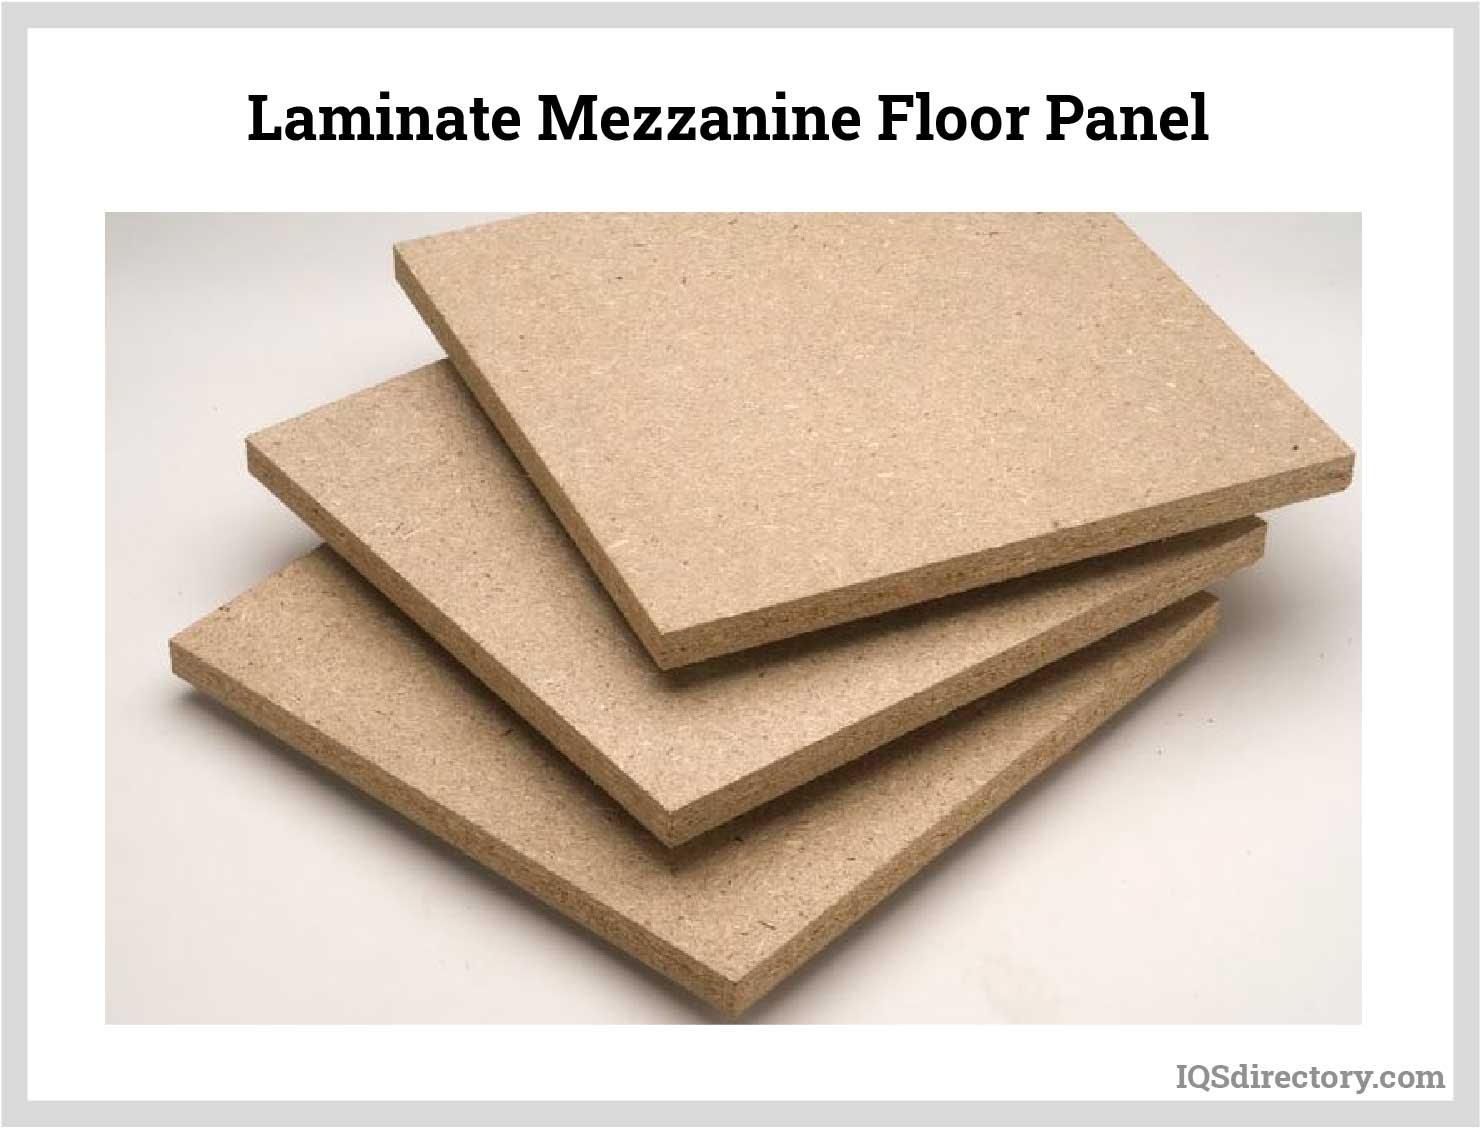 Laminate Mezzanine Floor Panel